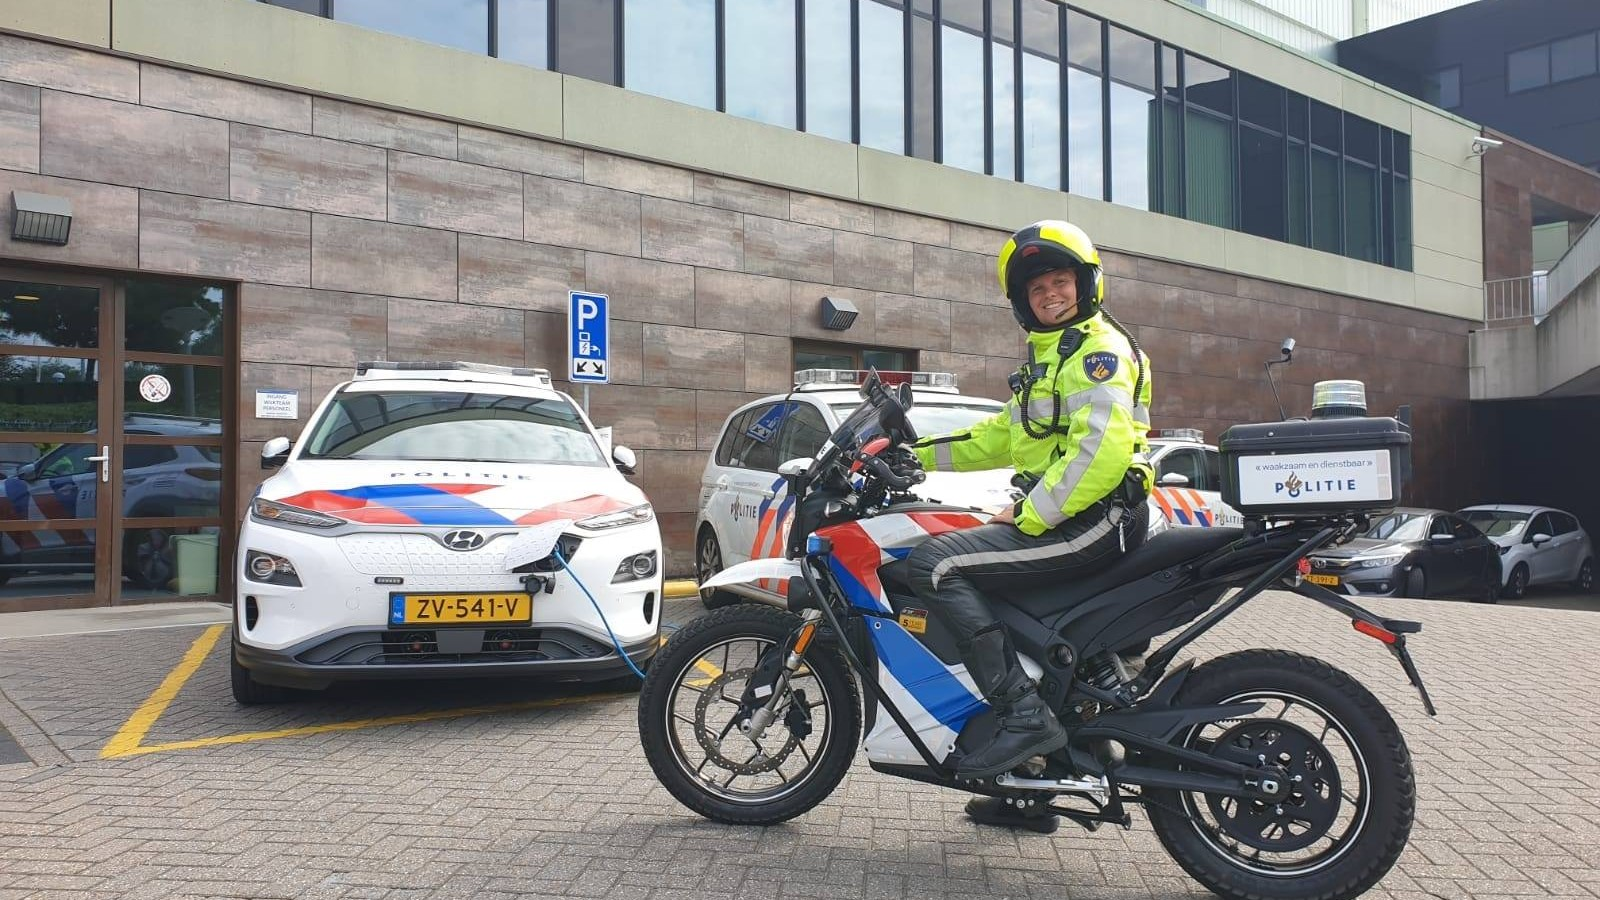 Politie Amsterdam Bijlmermeer